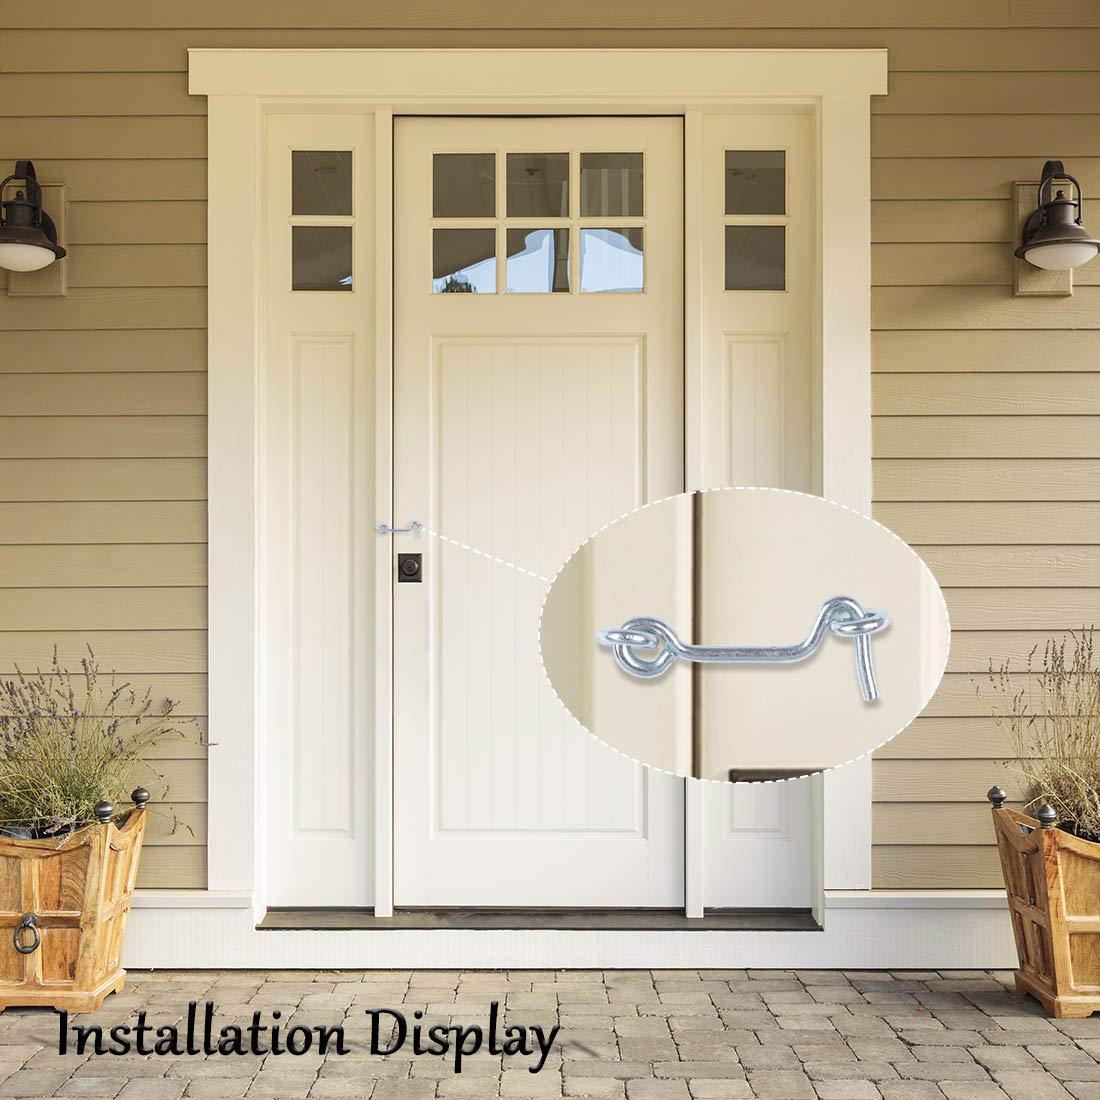 uxcell/® 2 Inch Cabin Hook Eye Latch Privacy Hook Door with Screw Lock Plating Finish for Gate Shutters Window Slide Barn Door 3 Pack